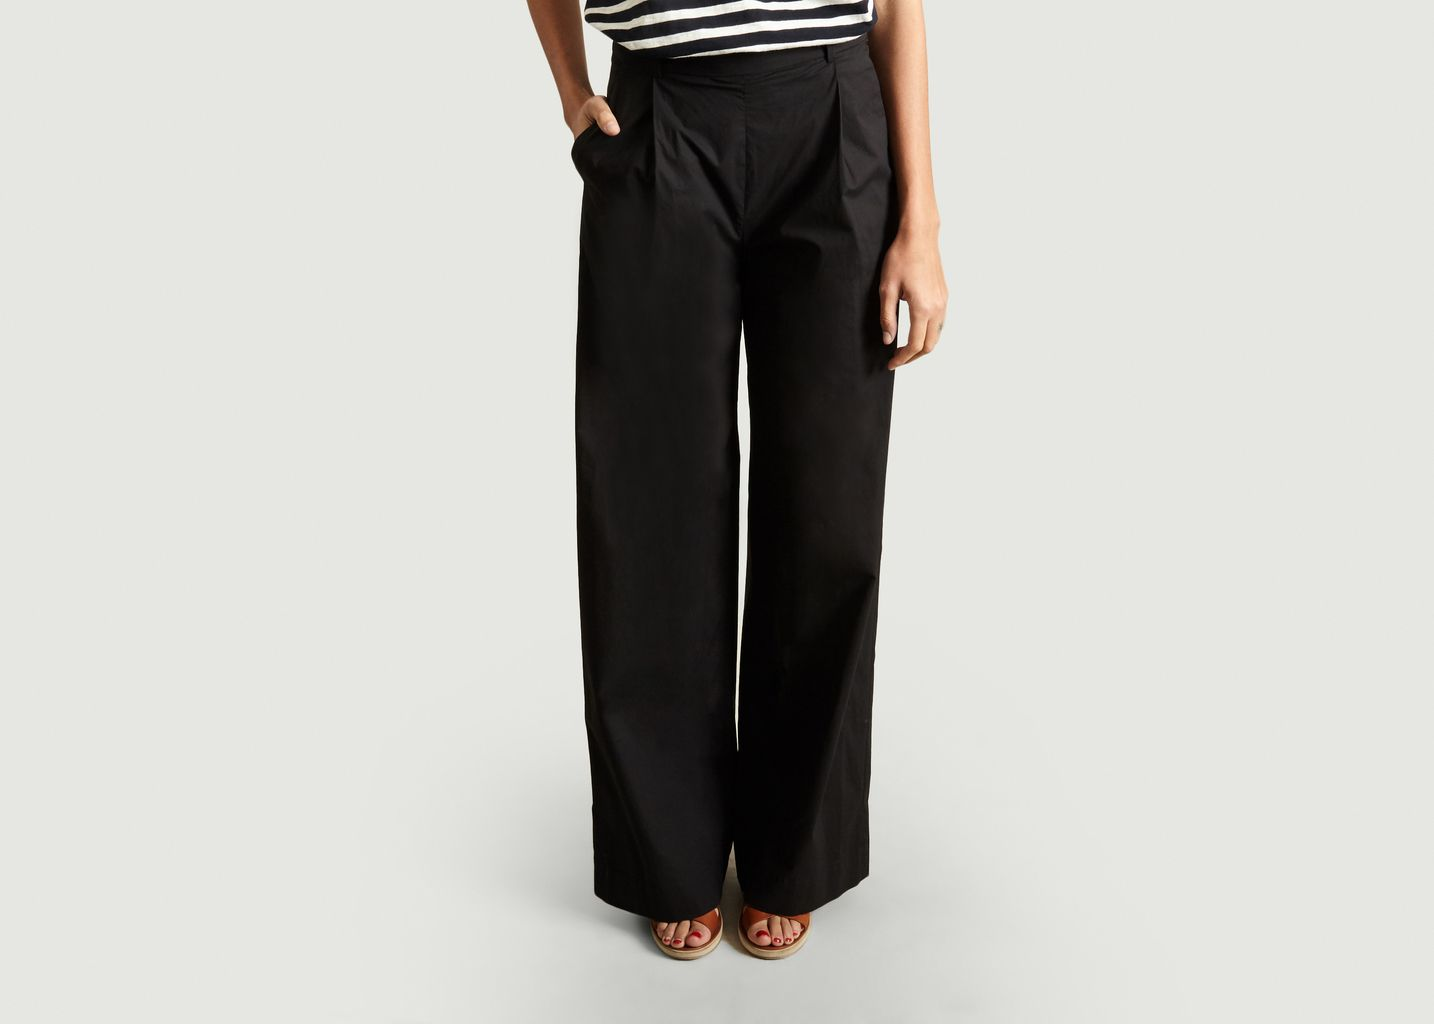 Pantalon Large Cote - Loreak Mendian